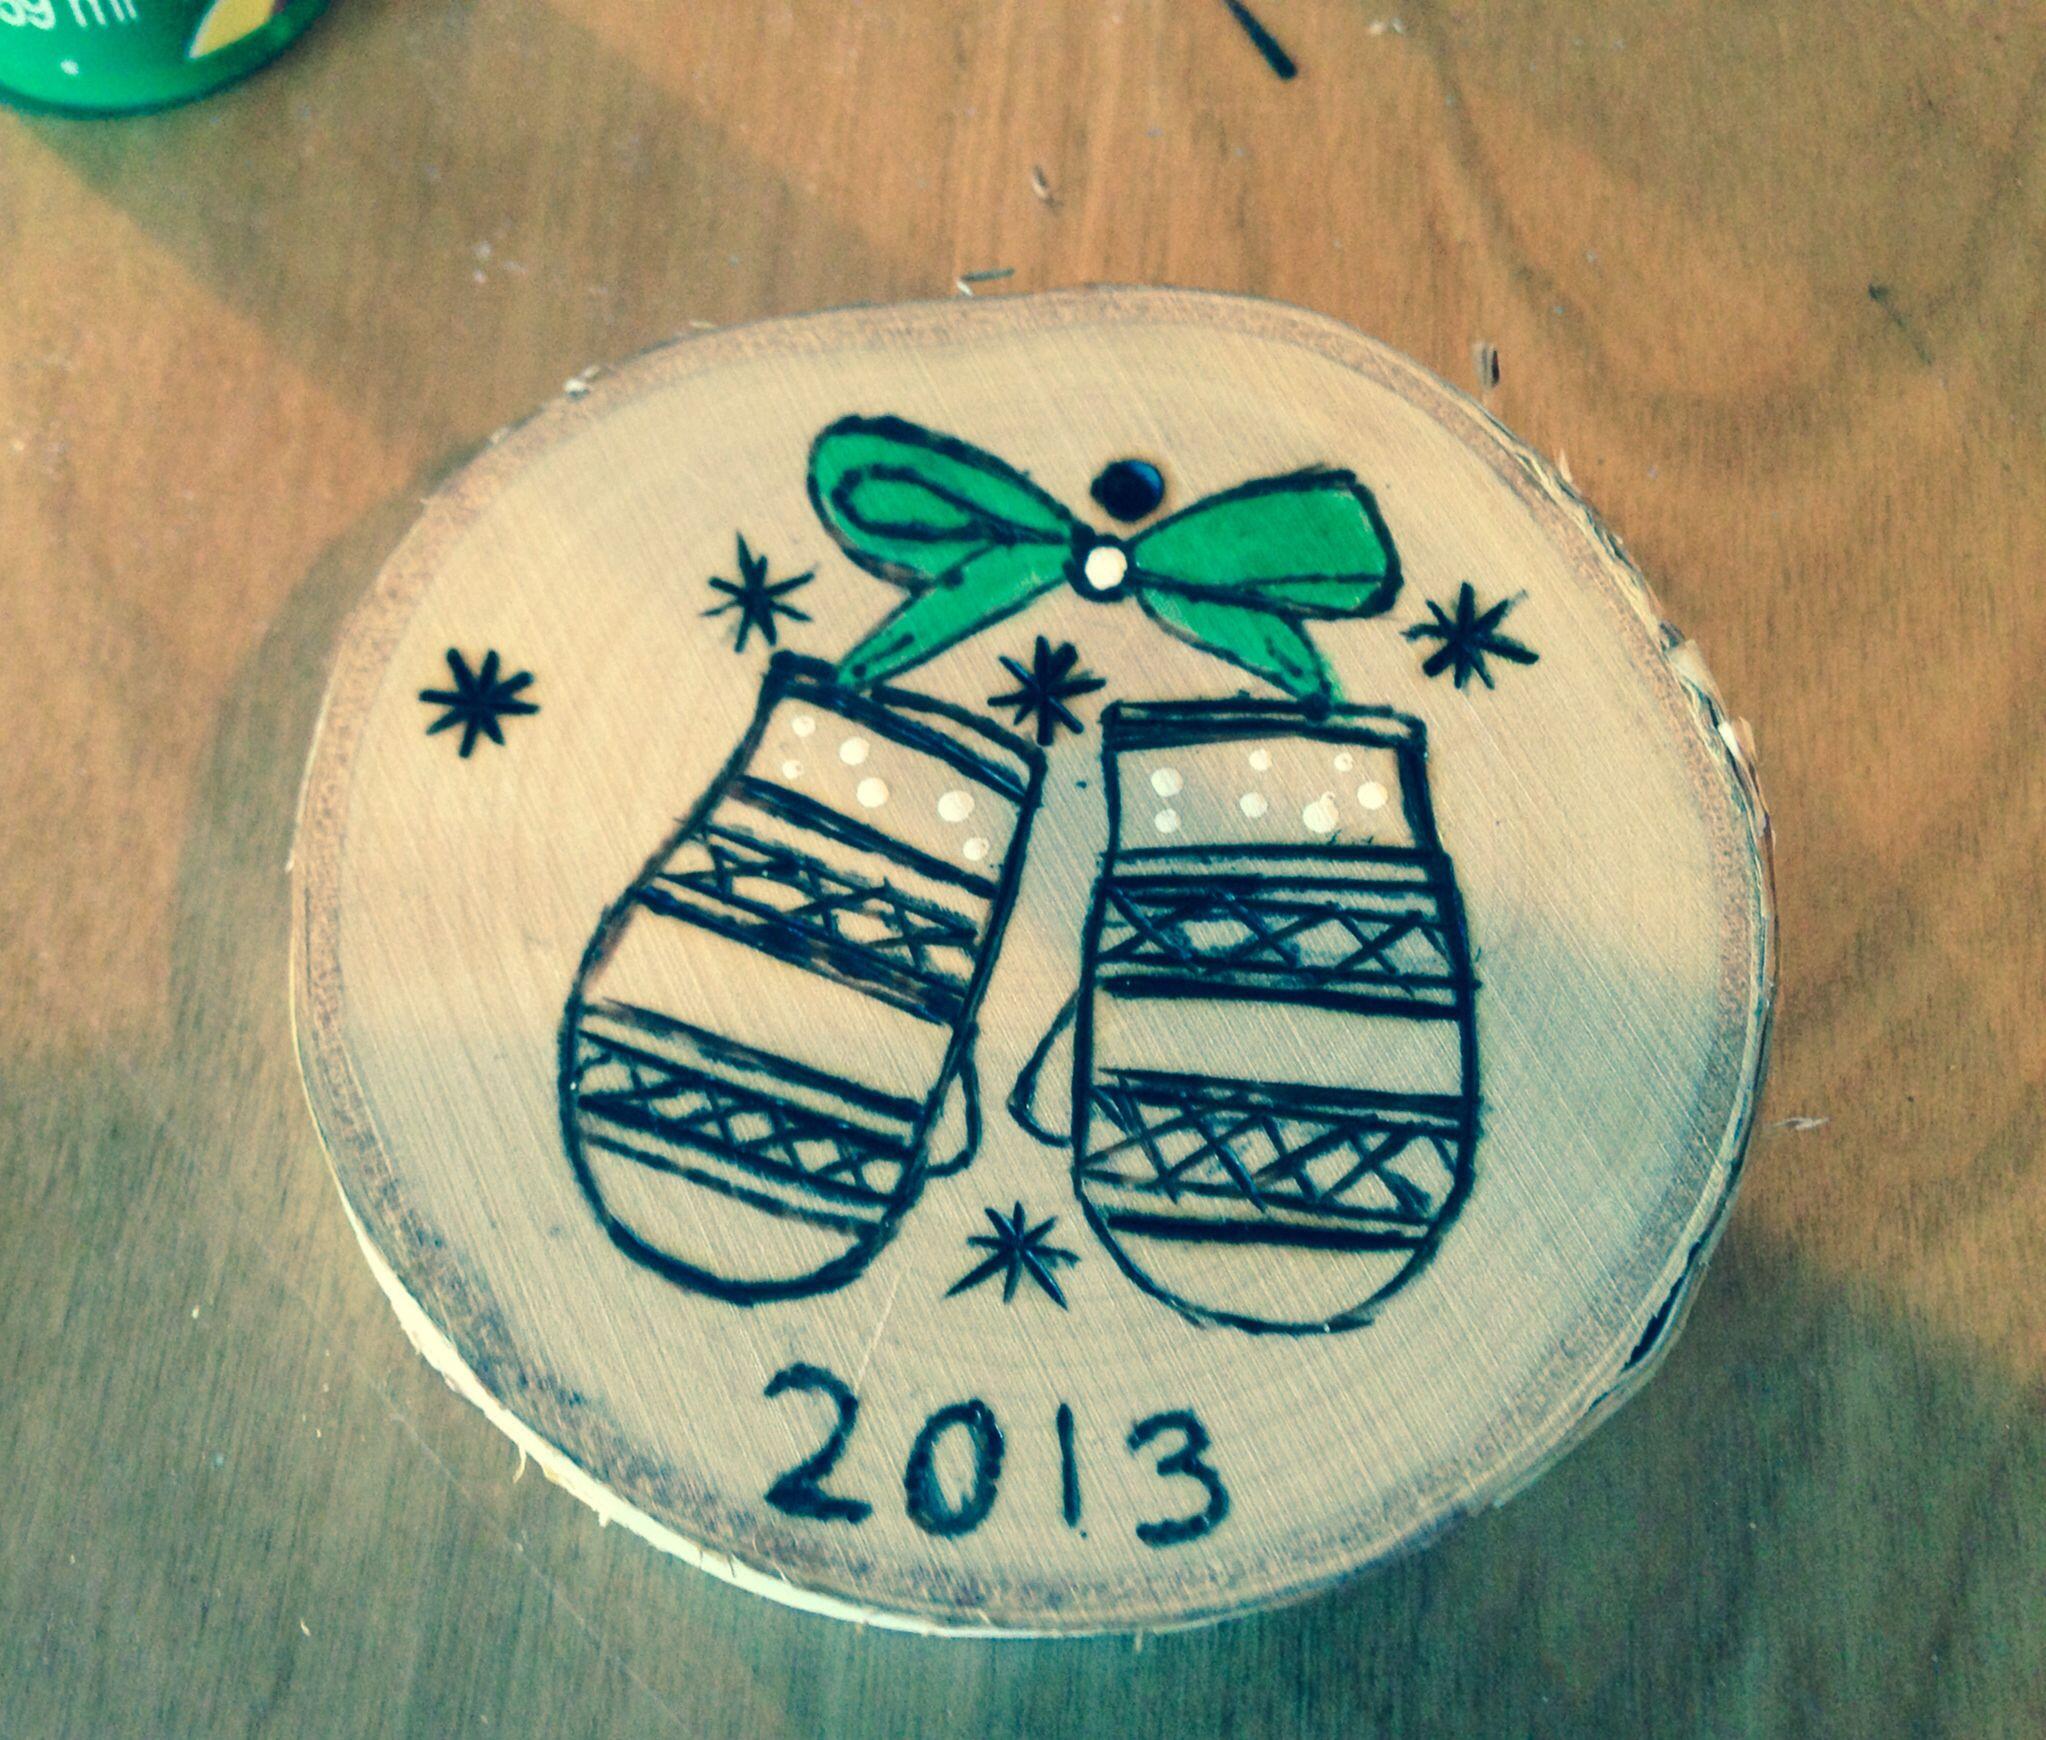 Wood burned ornament Christmas 2013. B.louie